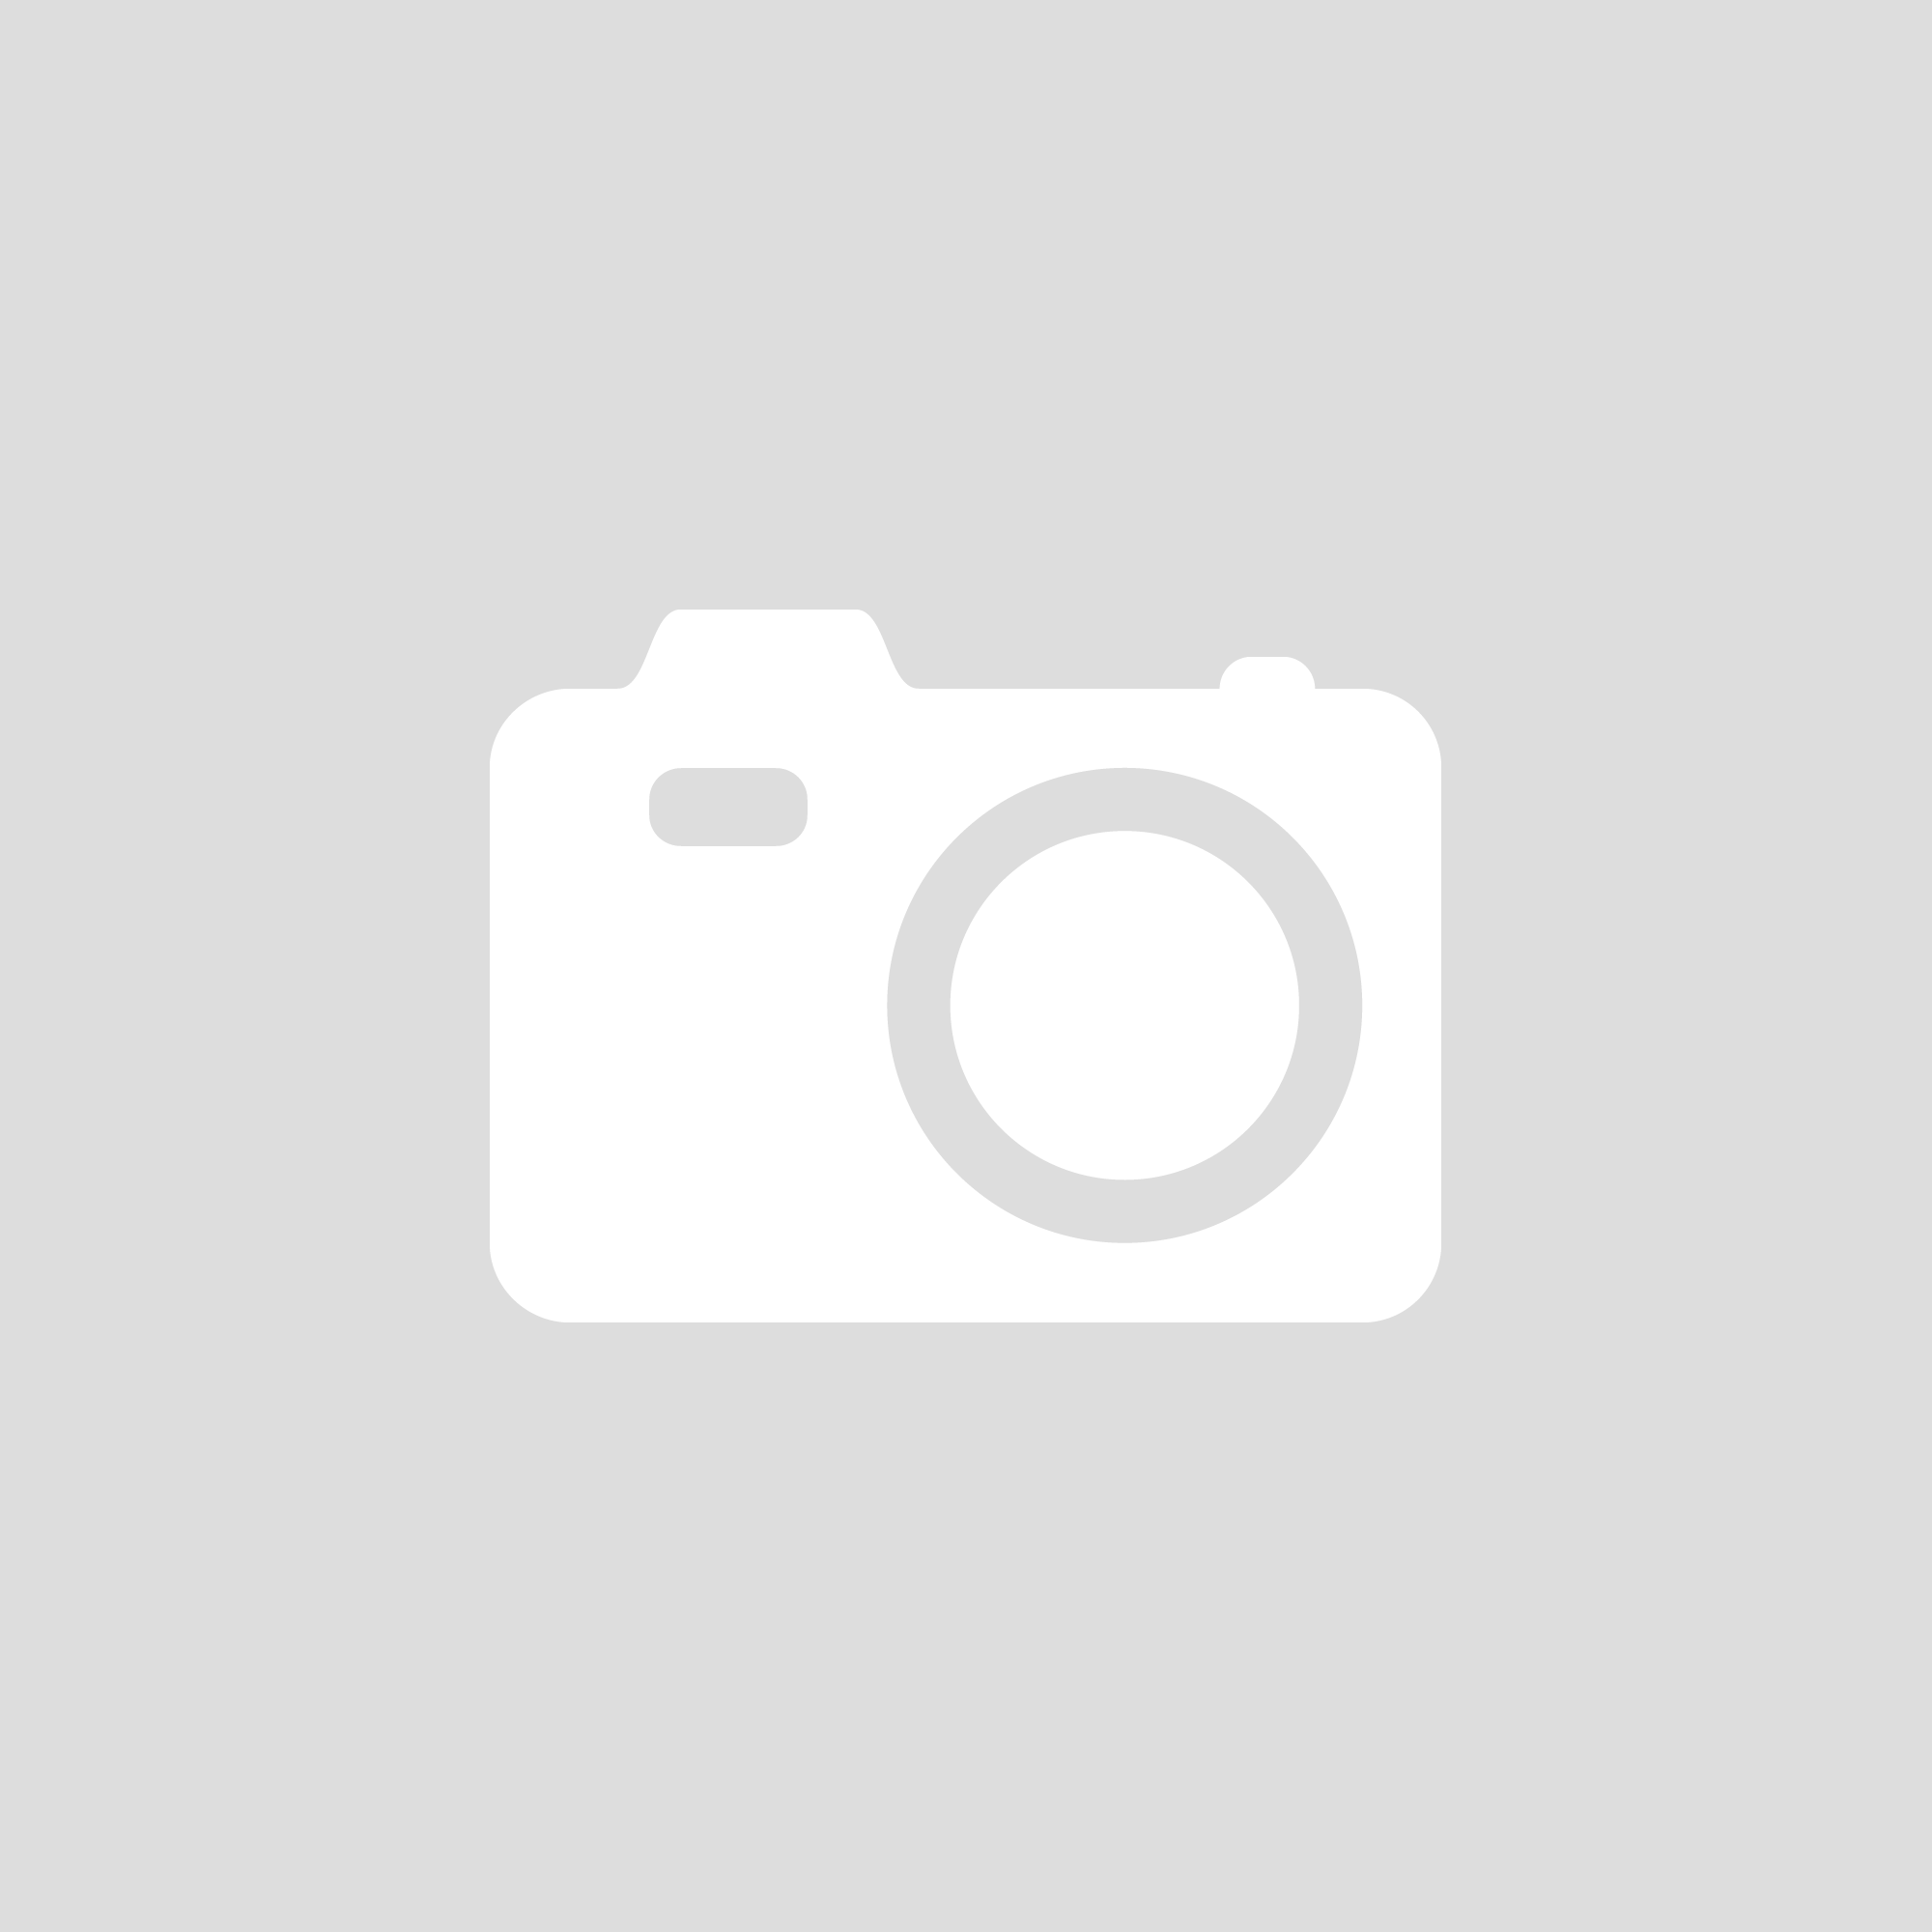 "2"" (50mm) Redline Adhesive / Paint Brush by Lynwood"